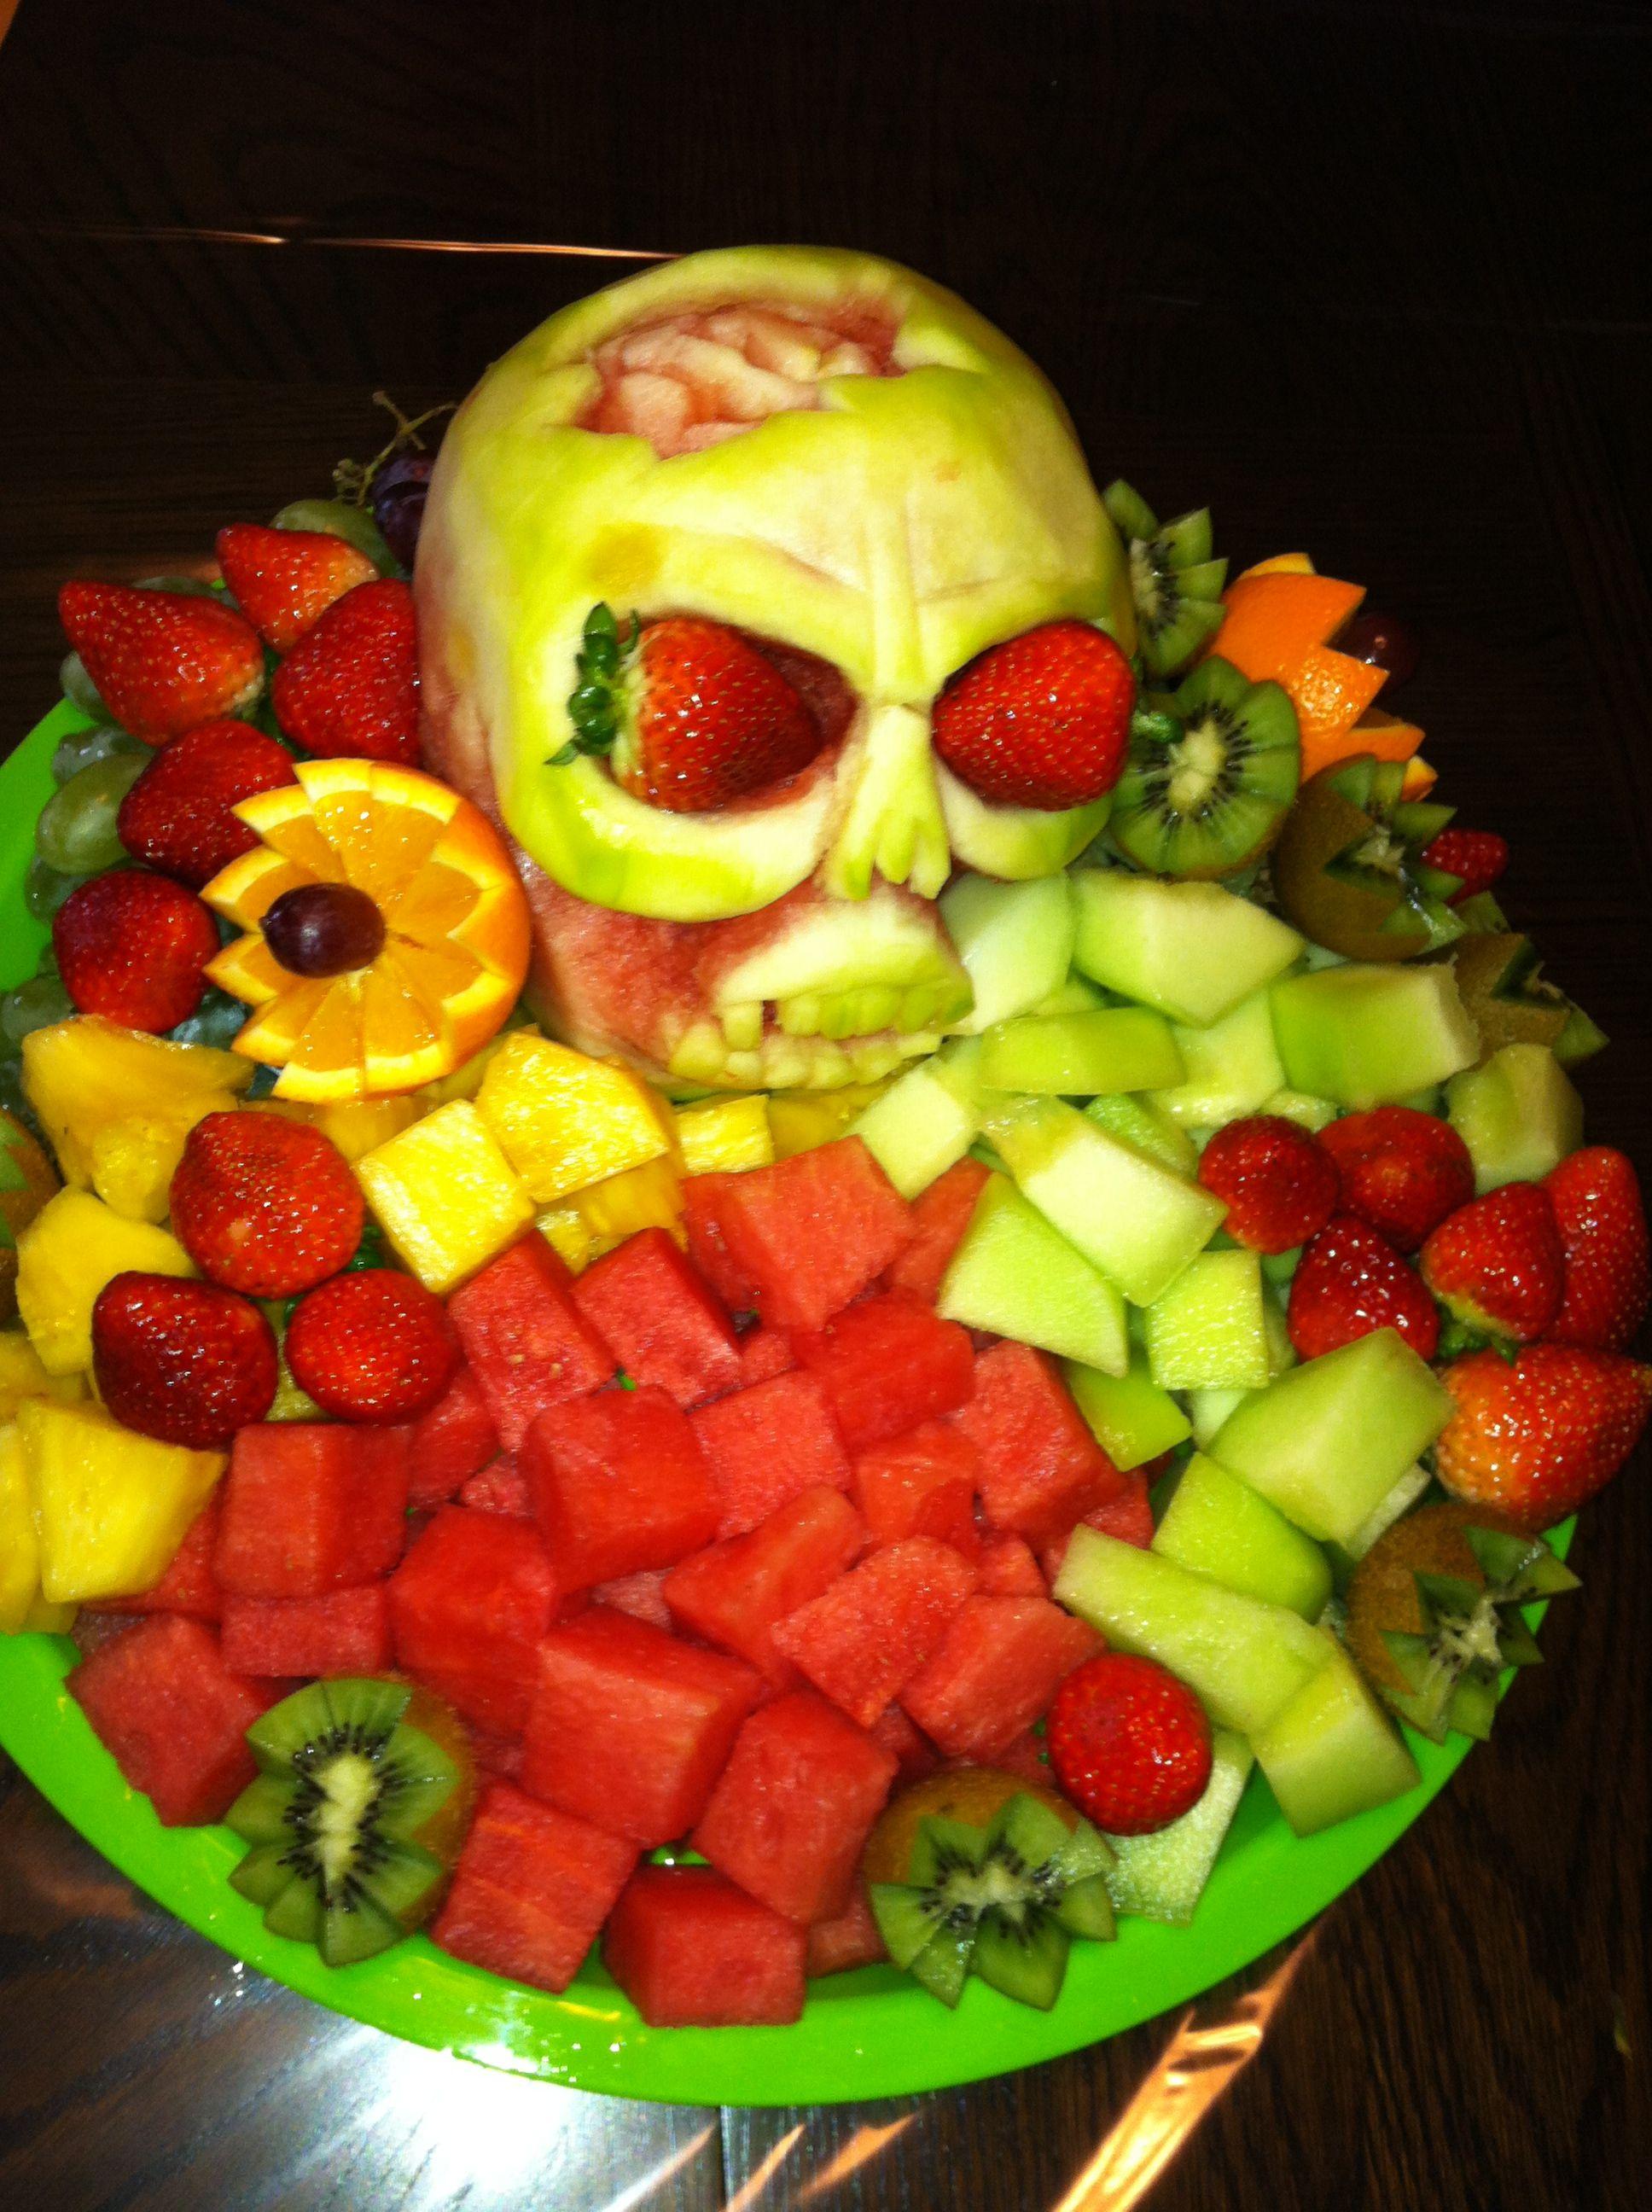 Halloween fruit carving  Food carving, Fruit carving, Halloween fruit